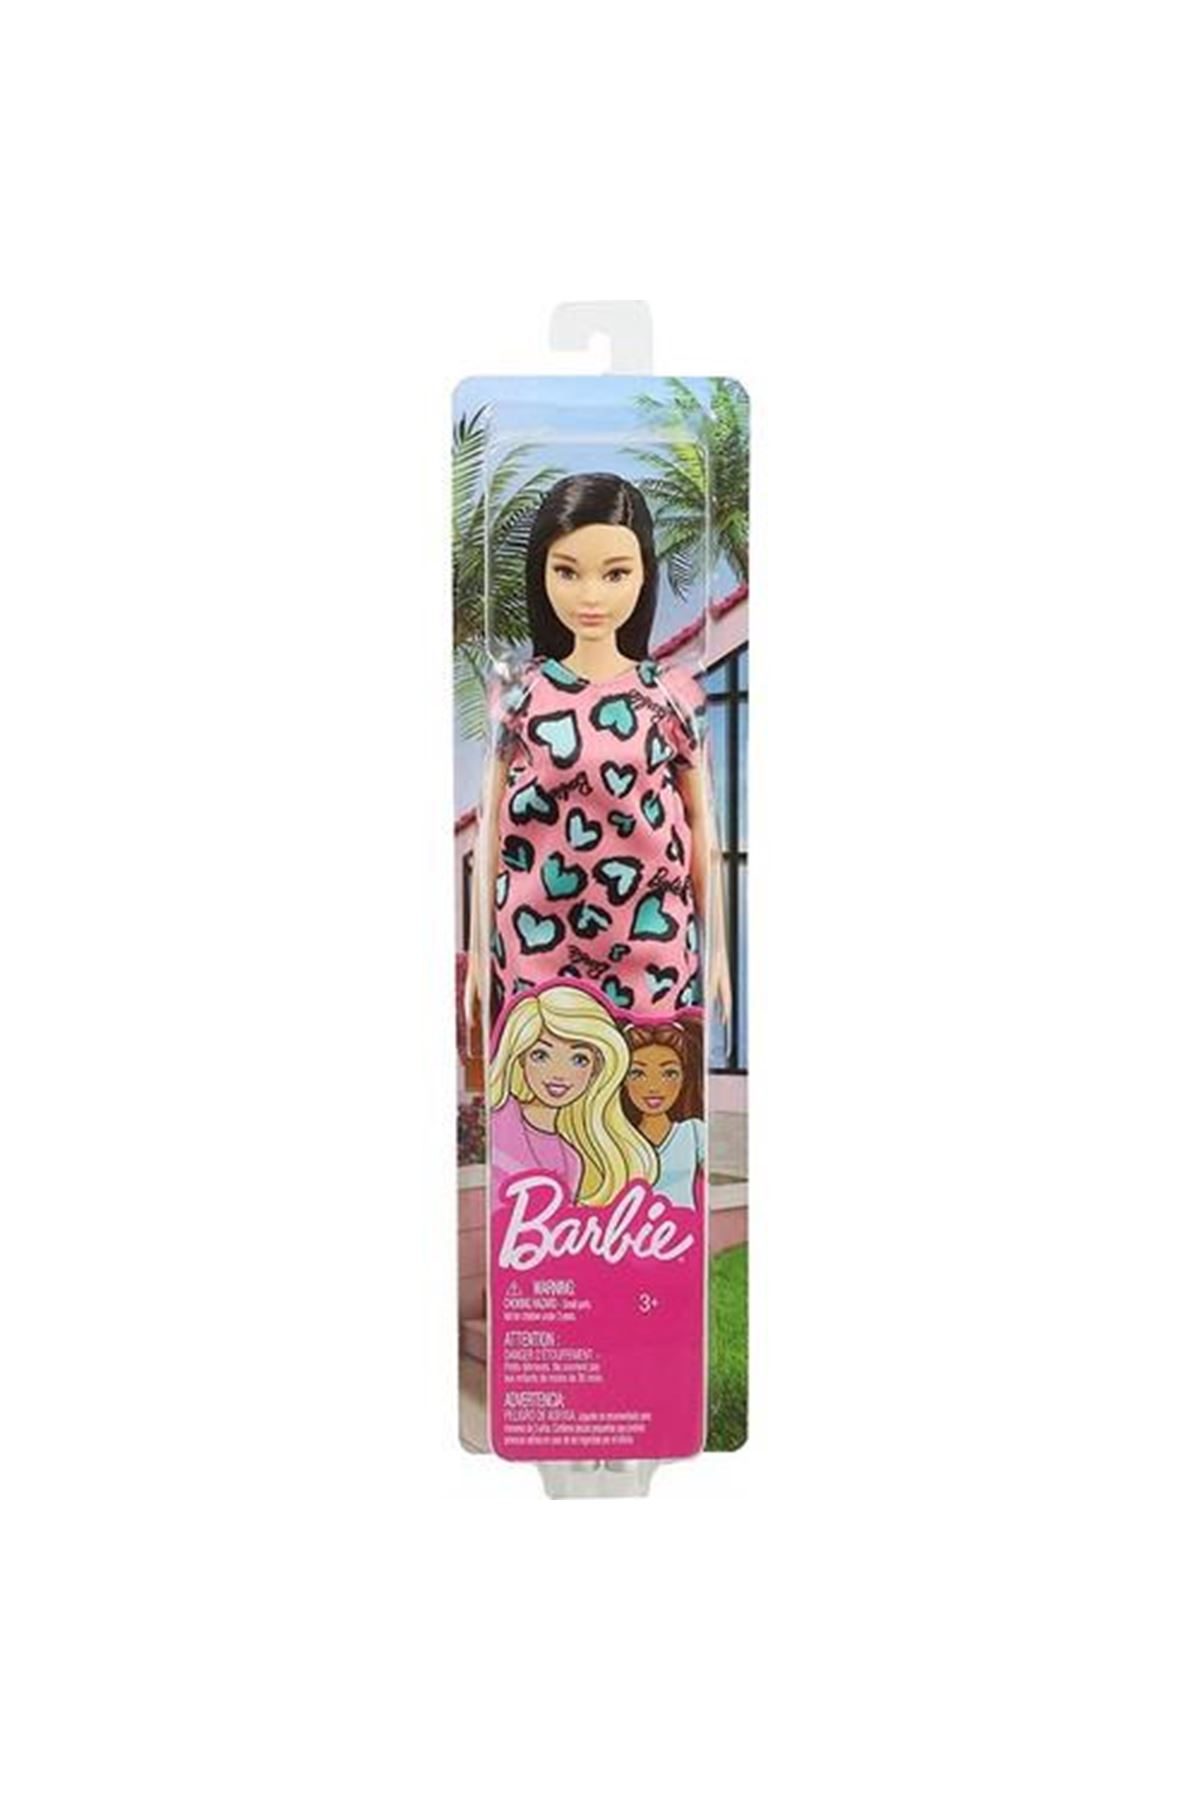 Barbie Şık Barbie T7439 GHW46